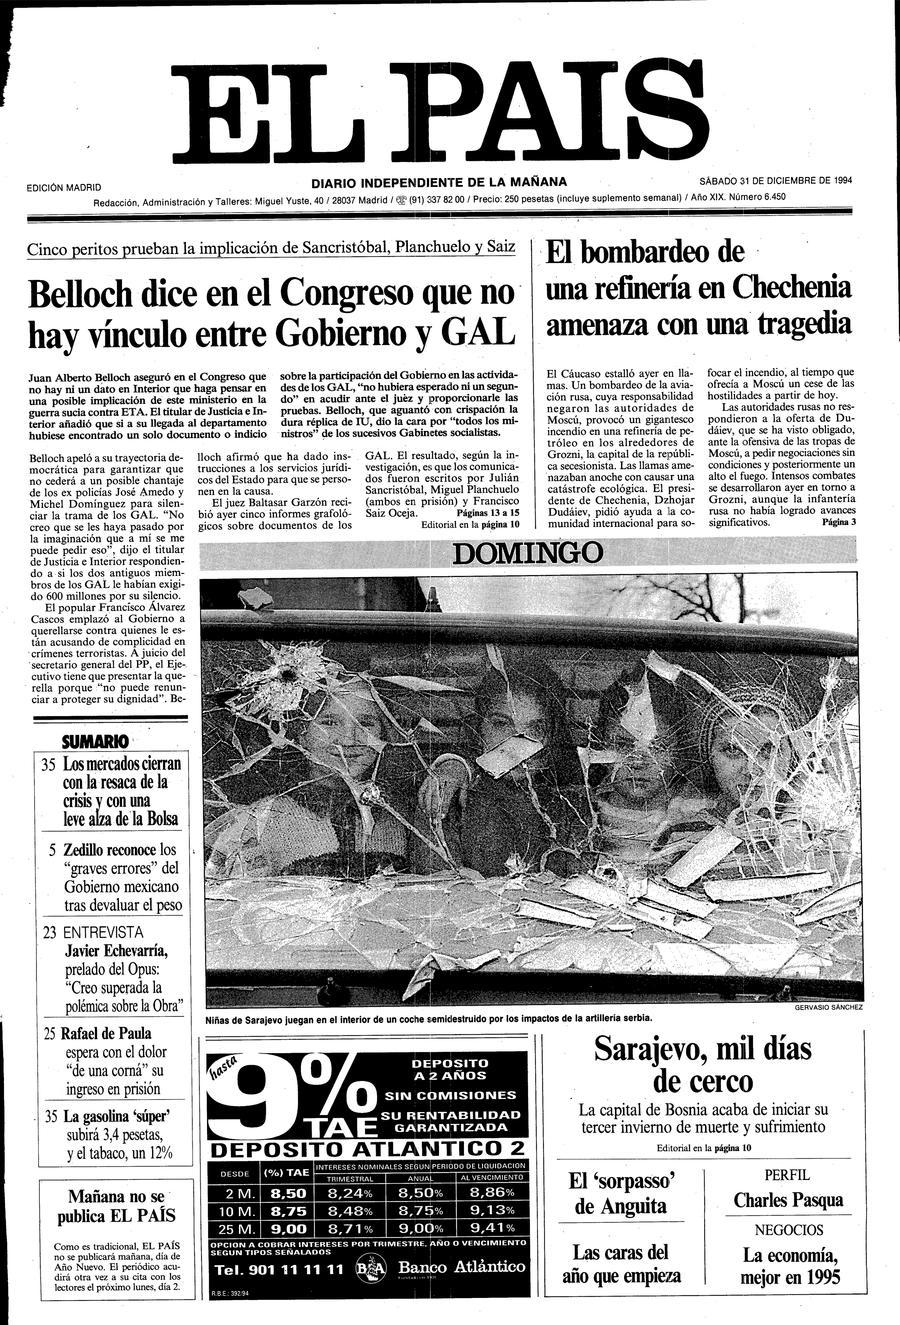 31 de Diciembre de 1994